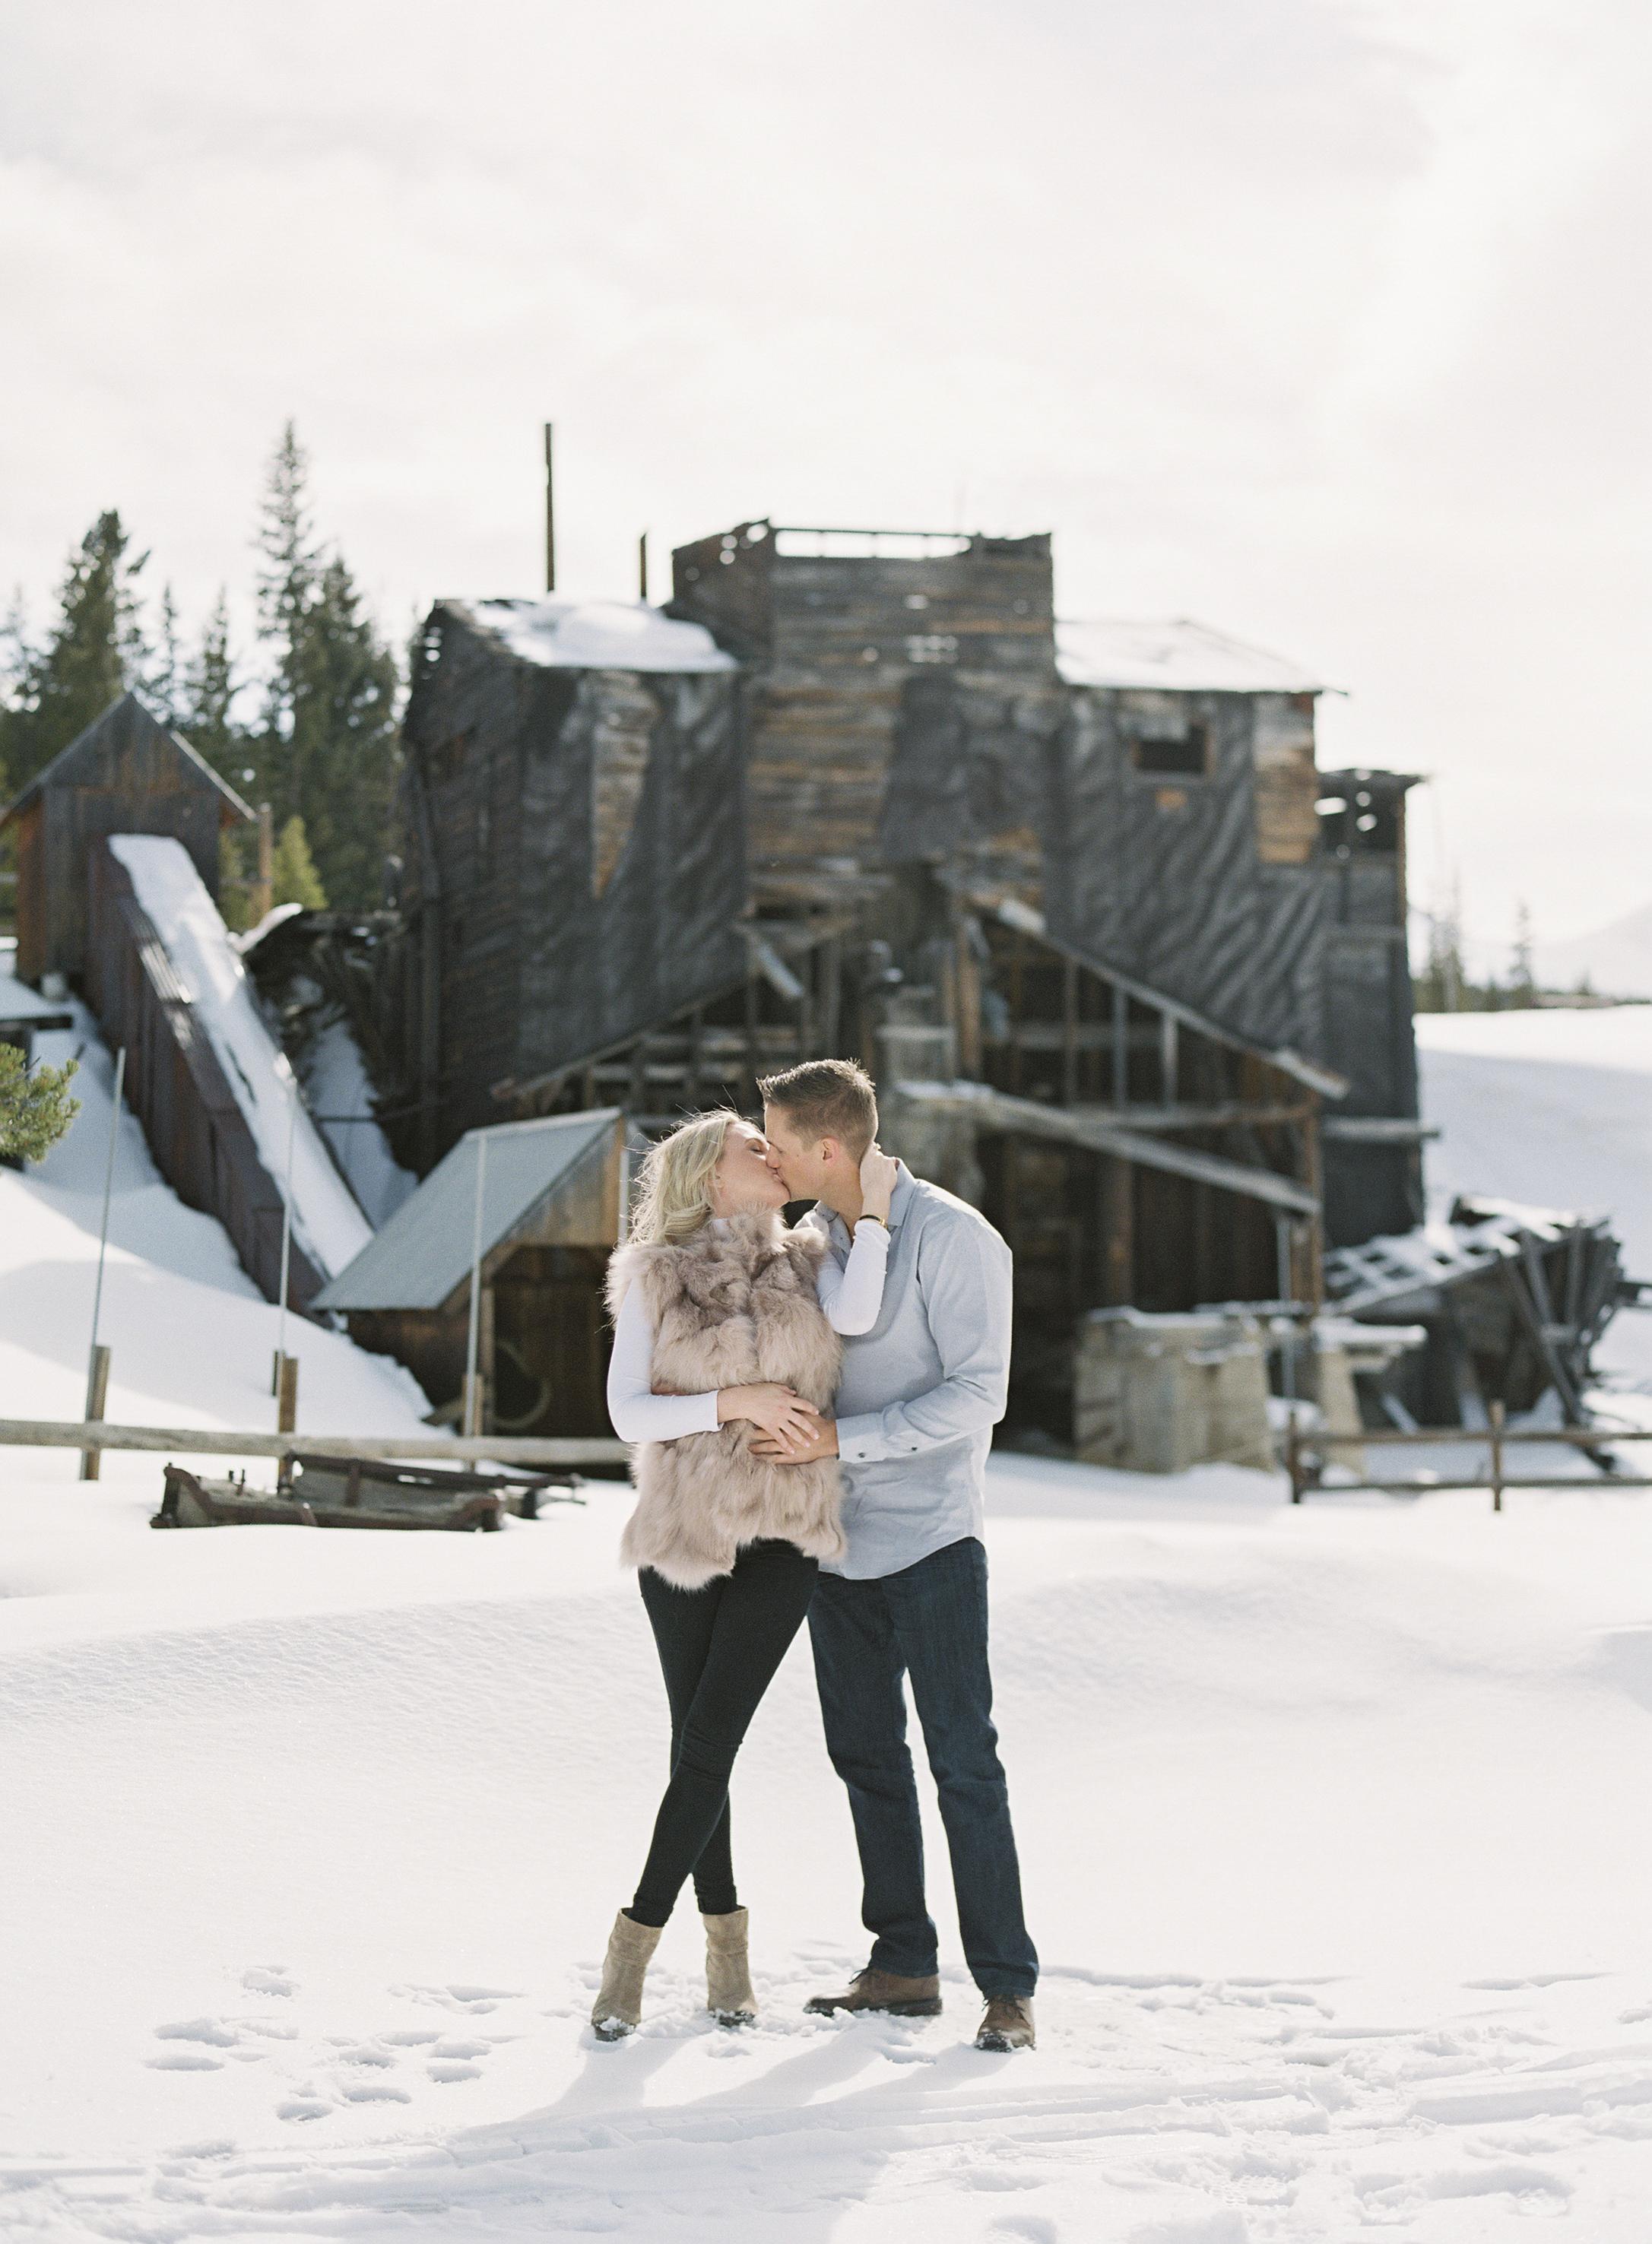 Sarah and John Engaged-Carrie King Photographer37.jpg